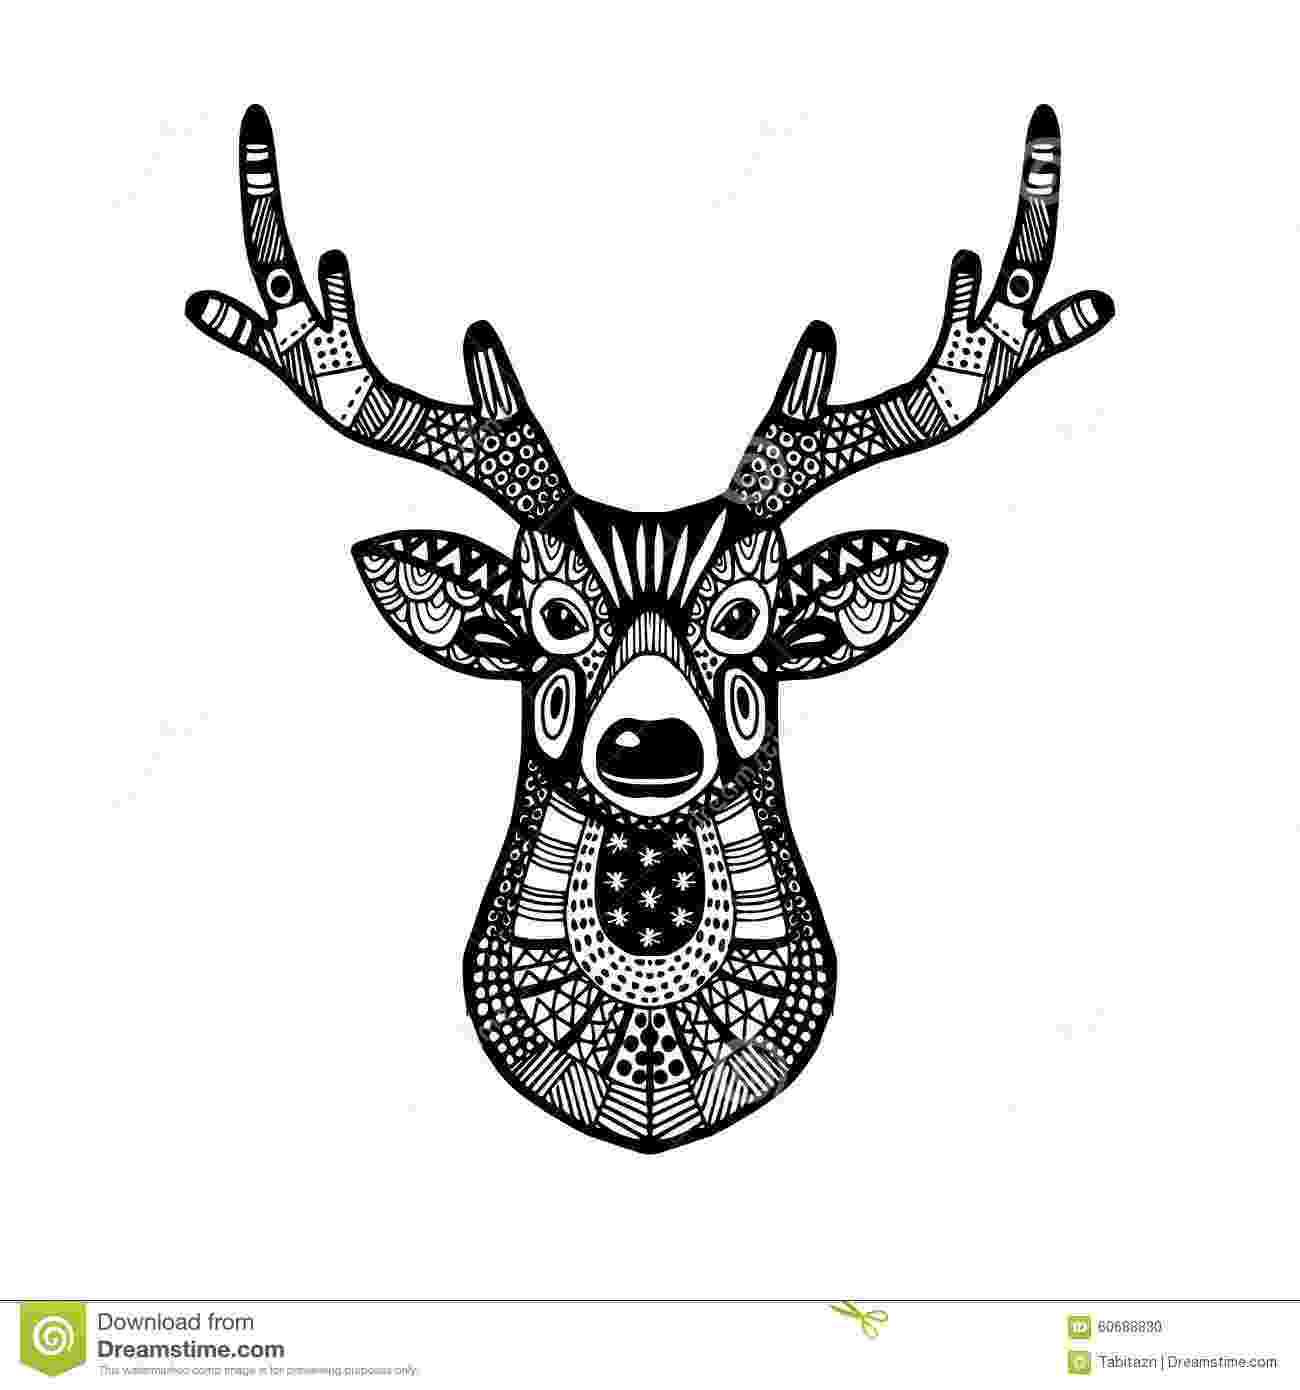 deer zentangle ornamental deer head trendy ethnic zentangle design hand zentangle deer